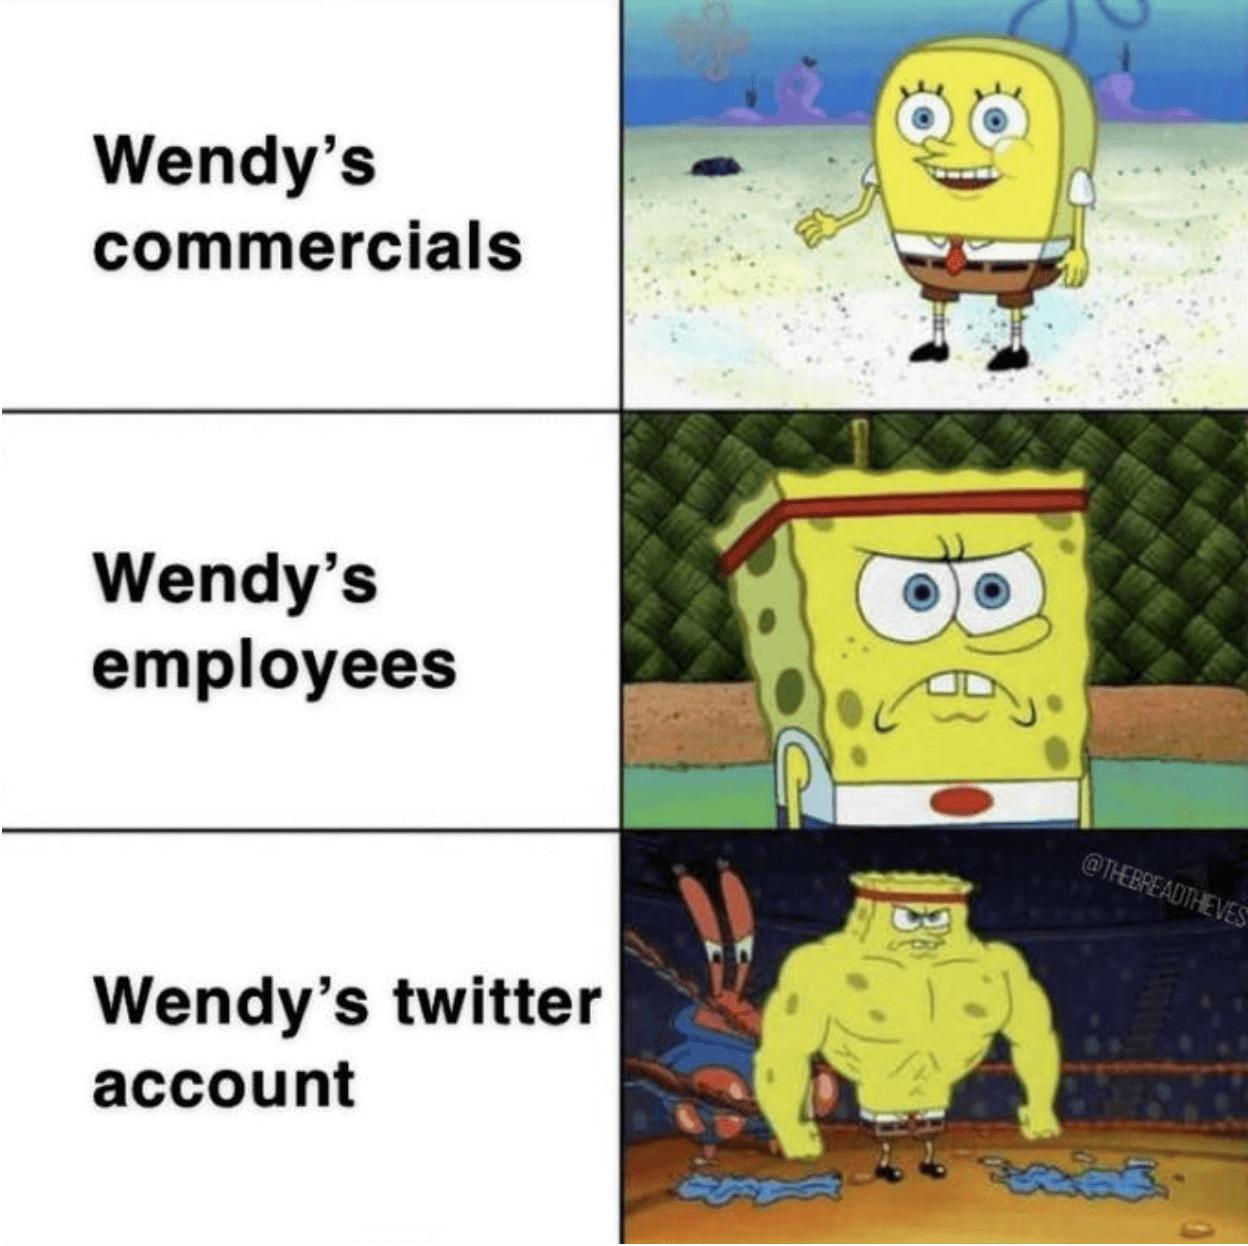 A Wendy's meme referencing Spongebob.